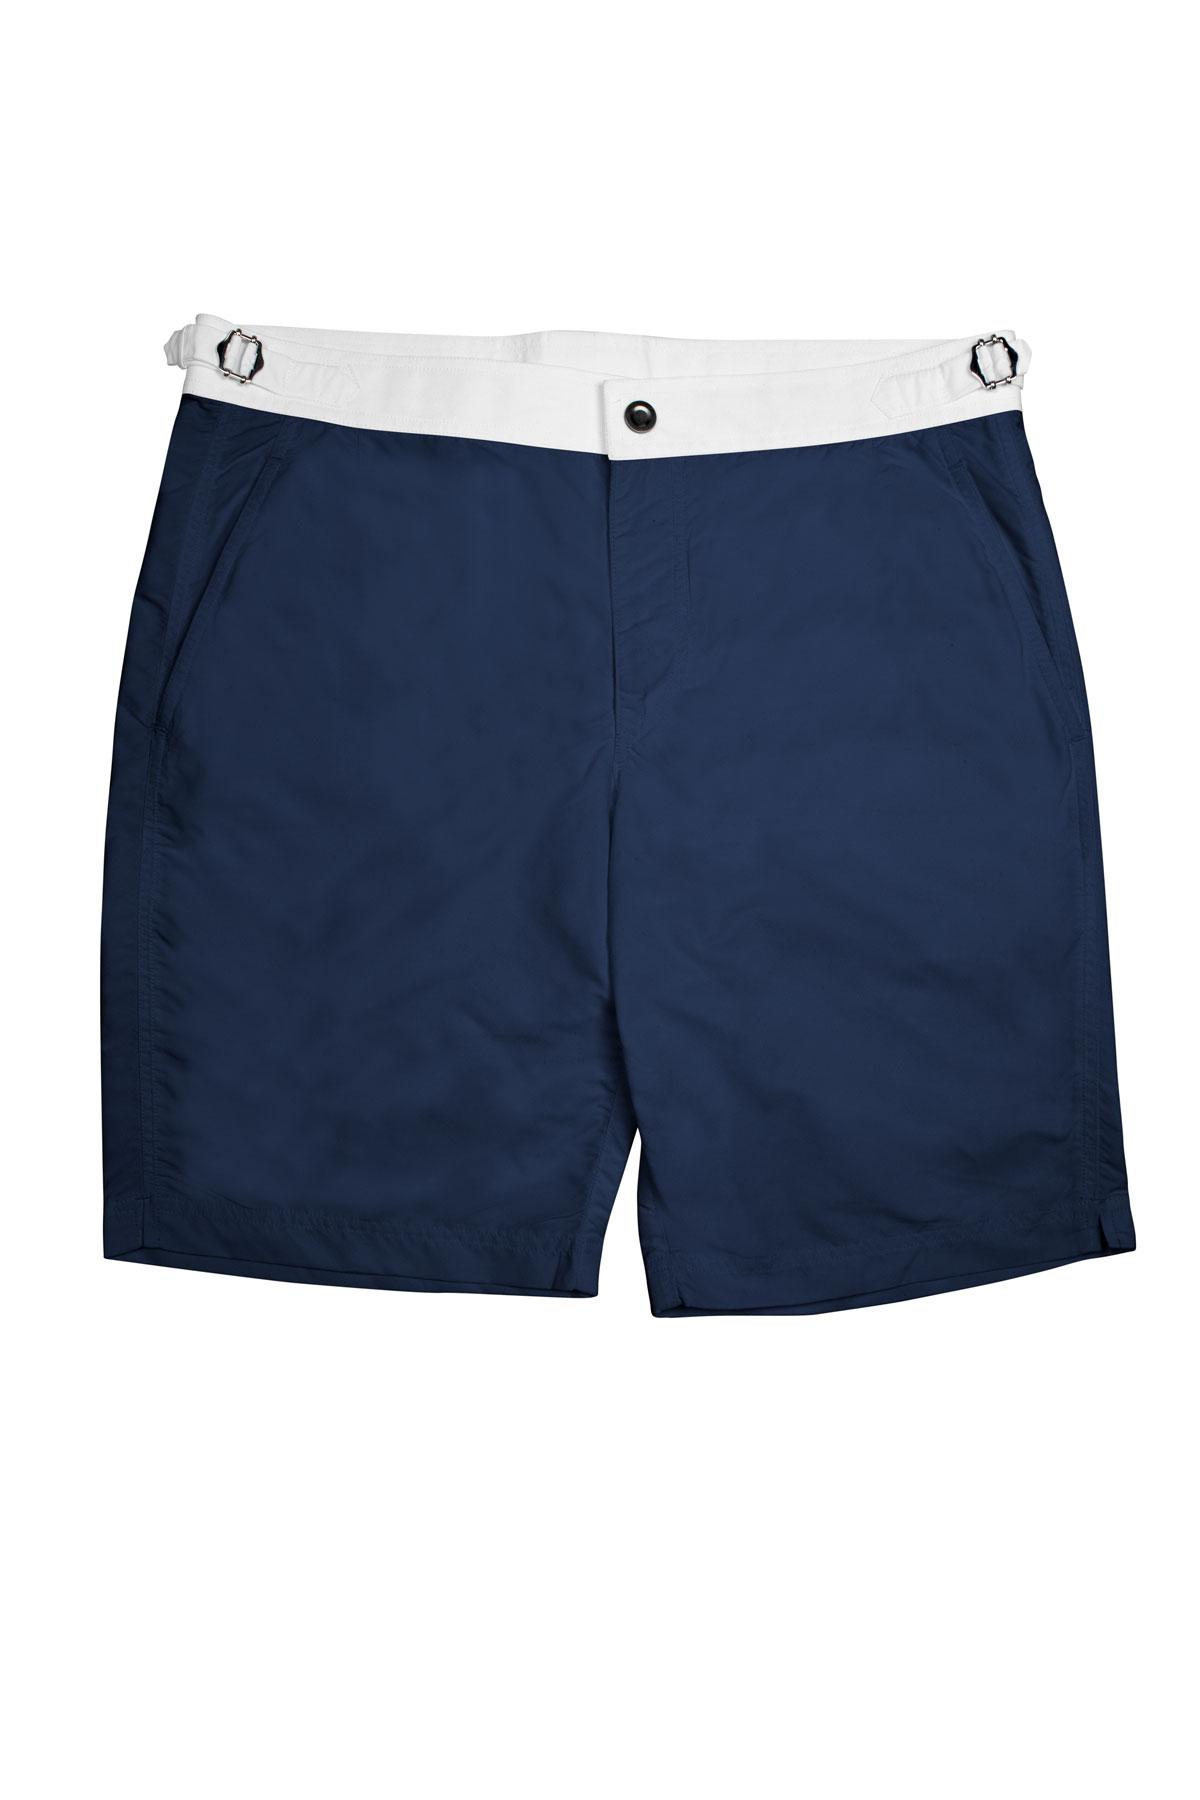 Navy Blue Swim Shorts w White Waistband